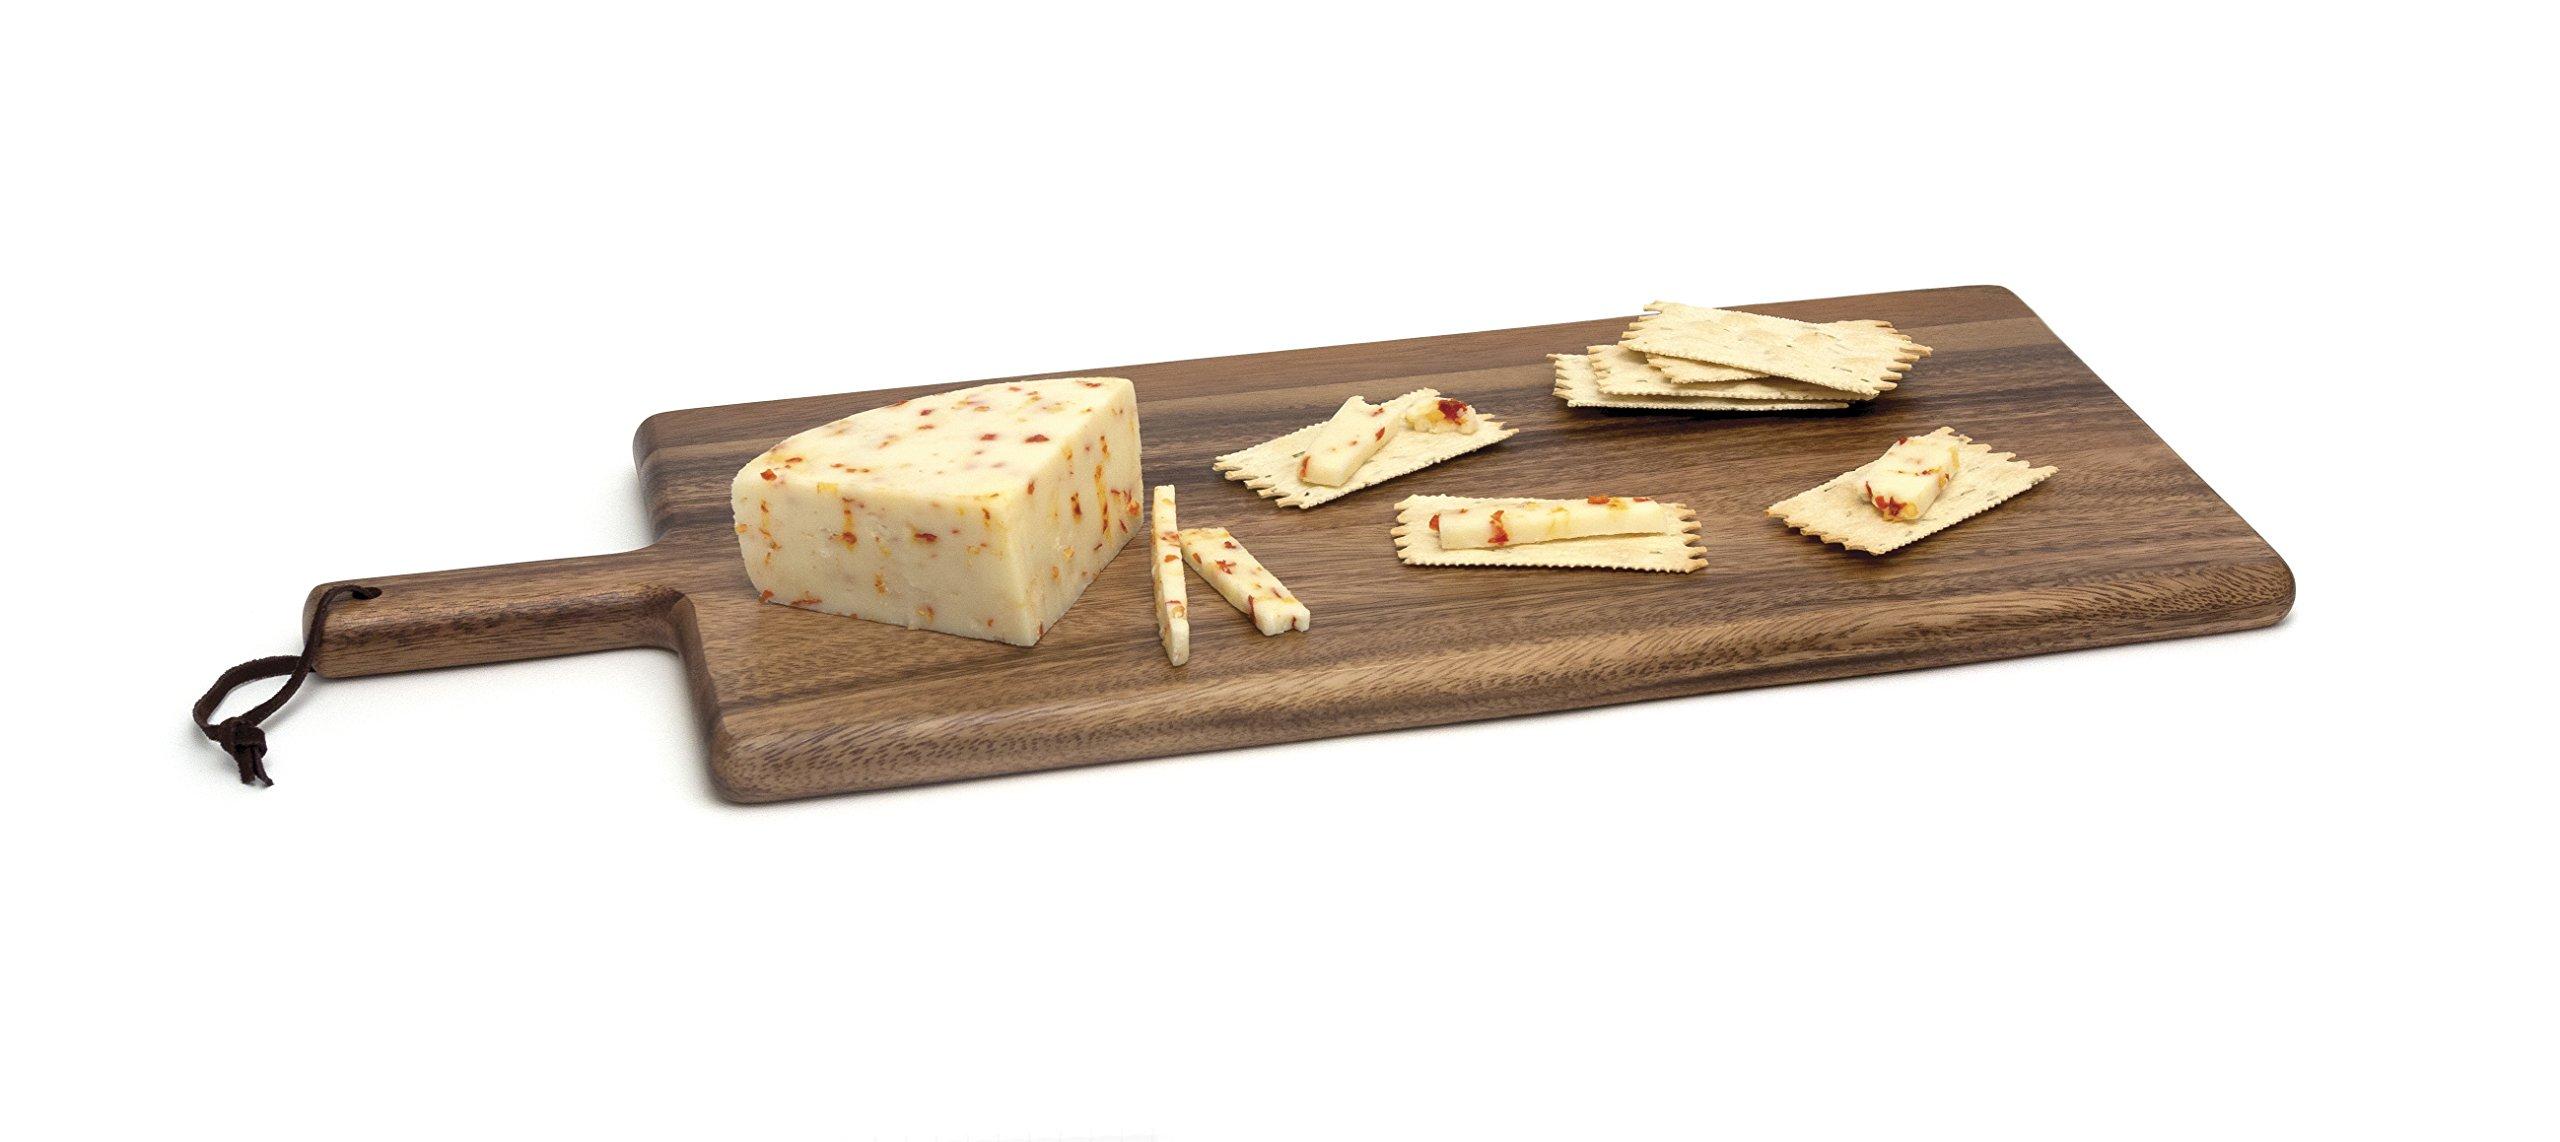 Lipper International 1028 Acacia Wood Kitchen Cutting and Serving Board, 21-1/2'' x 8-3/4'' x 3/4'' by Lipper International (Image #2)